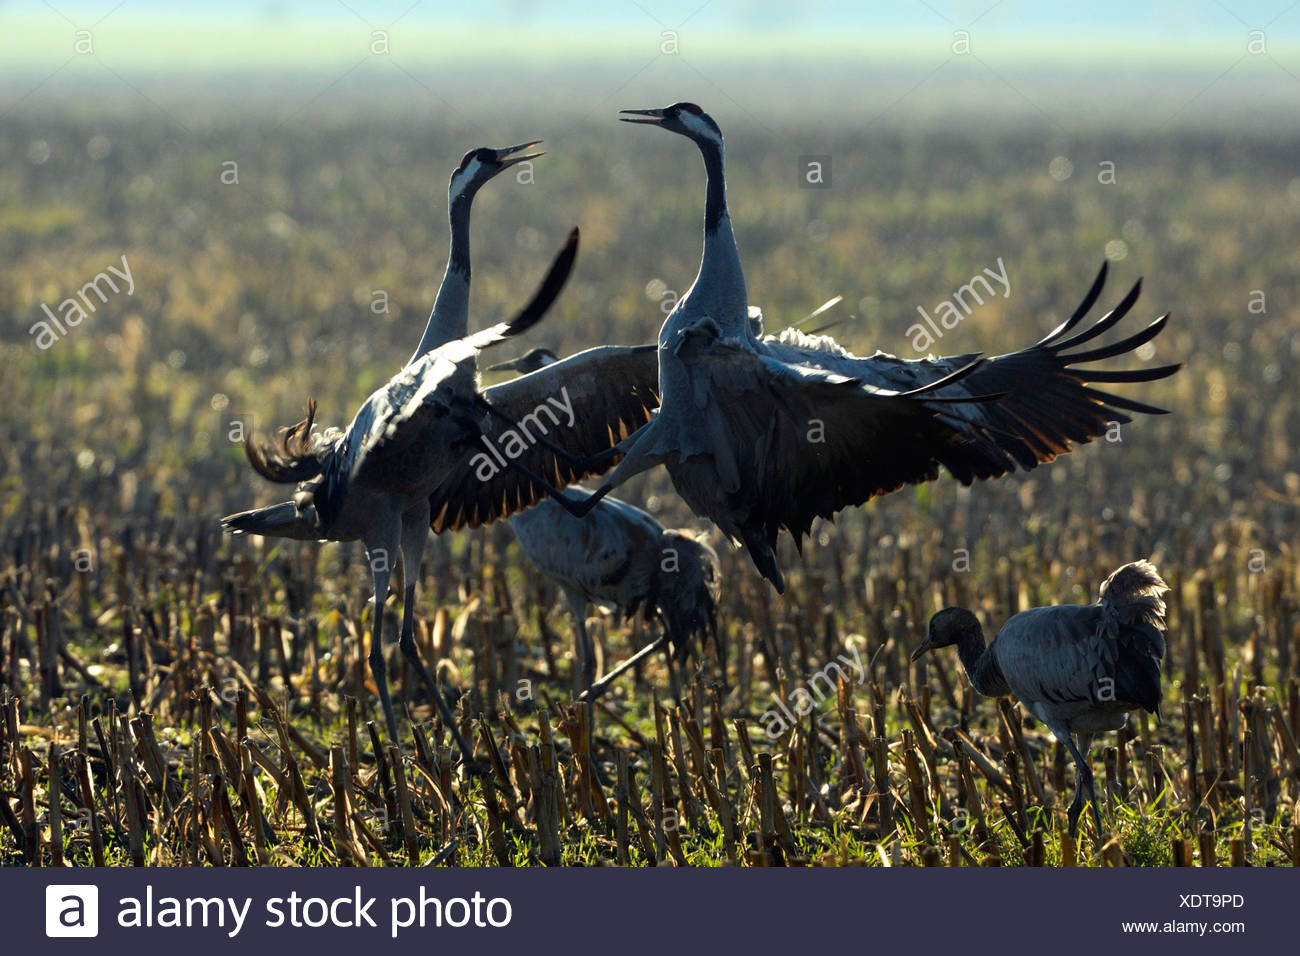 common crane (Grus grus), fighting on a stub field, Germany, Mecklenburg-Western Pomerania - Stock Image